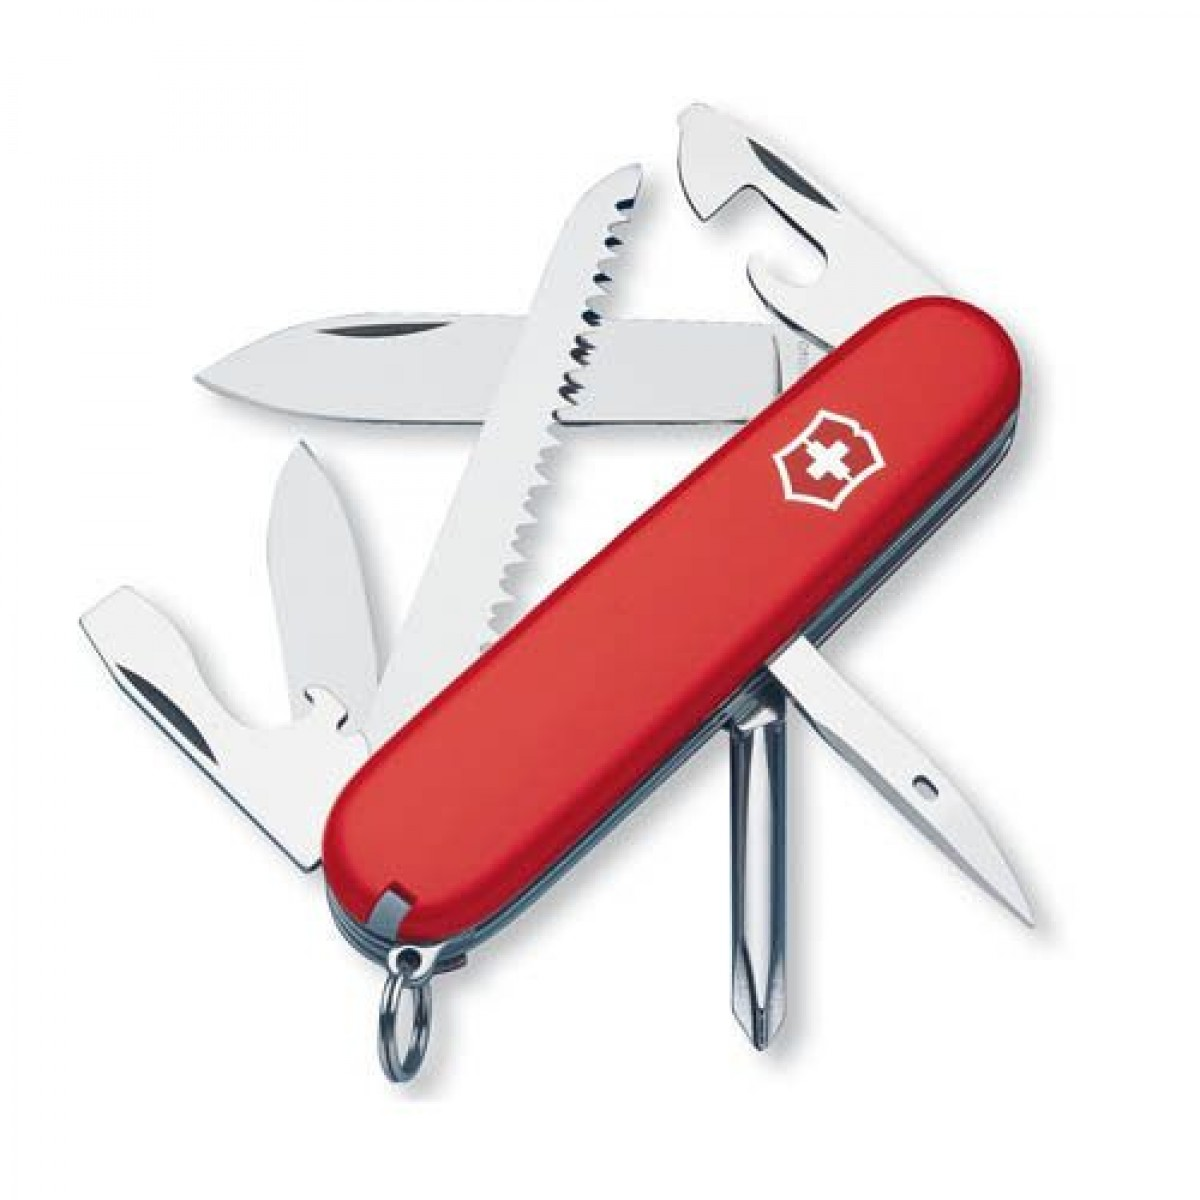 Victorinox Hiker Knife Victorinox Hiker Knife Victorinox